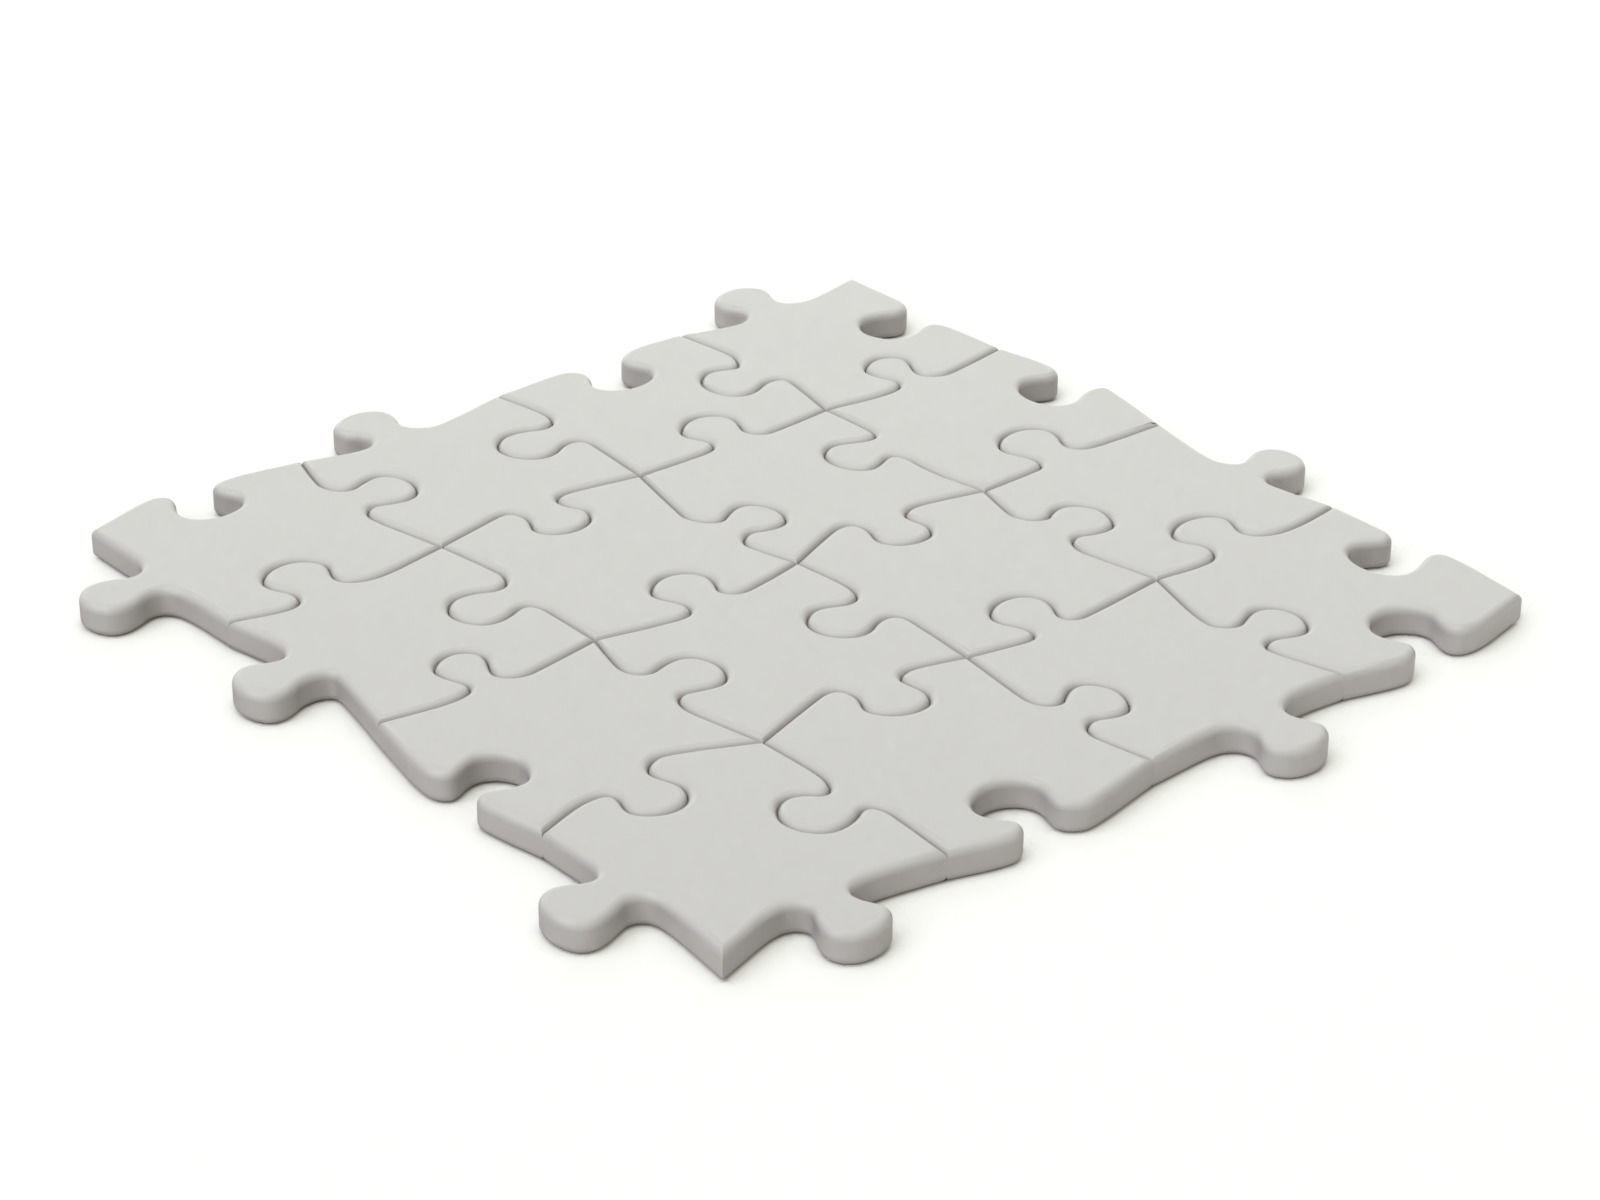 Repeatable jigsaw puzzle module